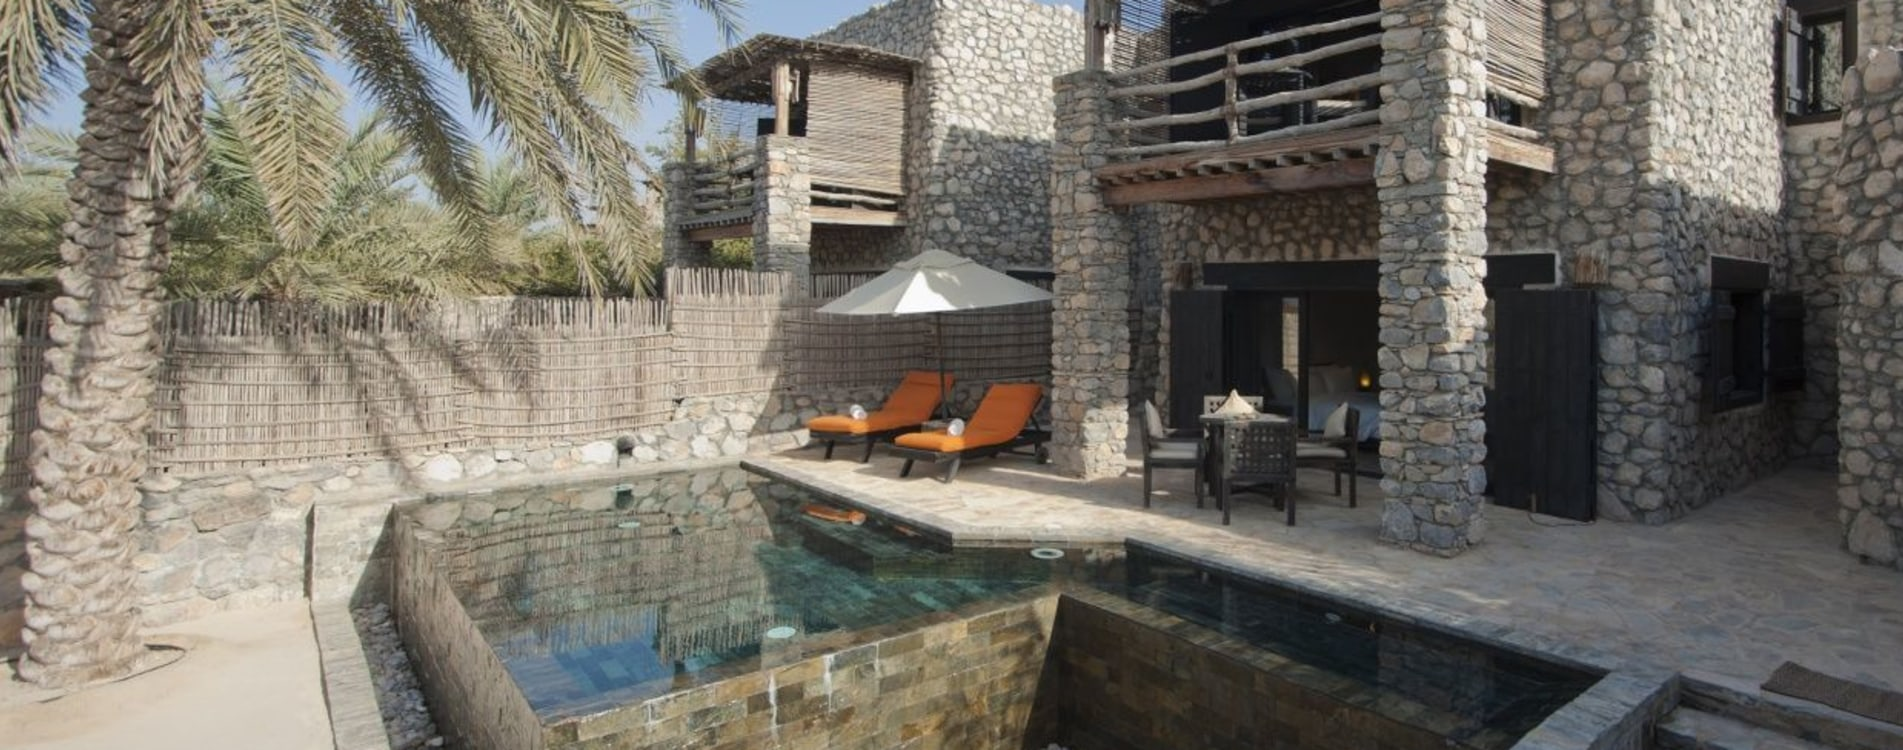 Six-Senses-Zighy-Bay-Duplex-2-bedroom-Pool-Villa-Exterior-Pool-Fassade-Oman.jpg